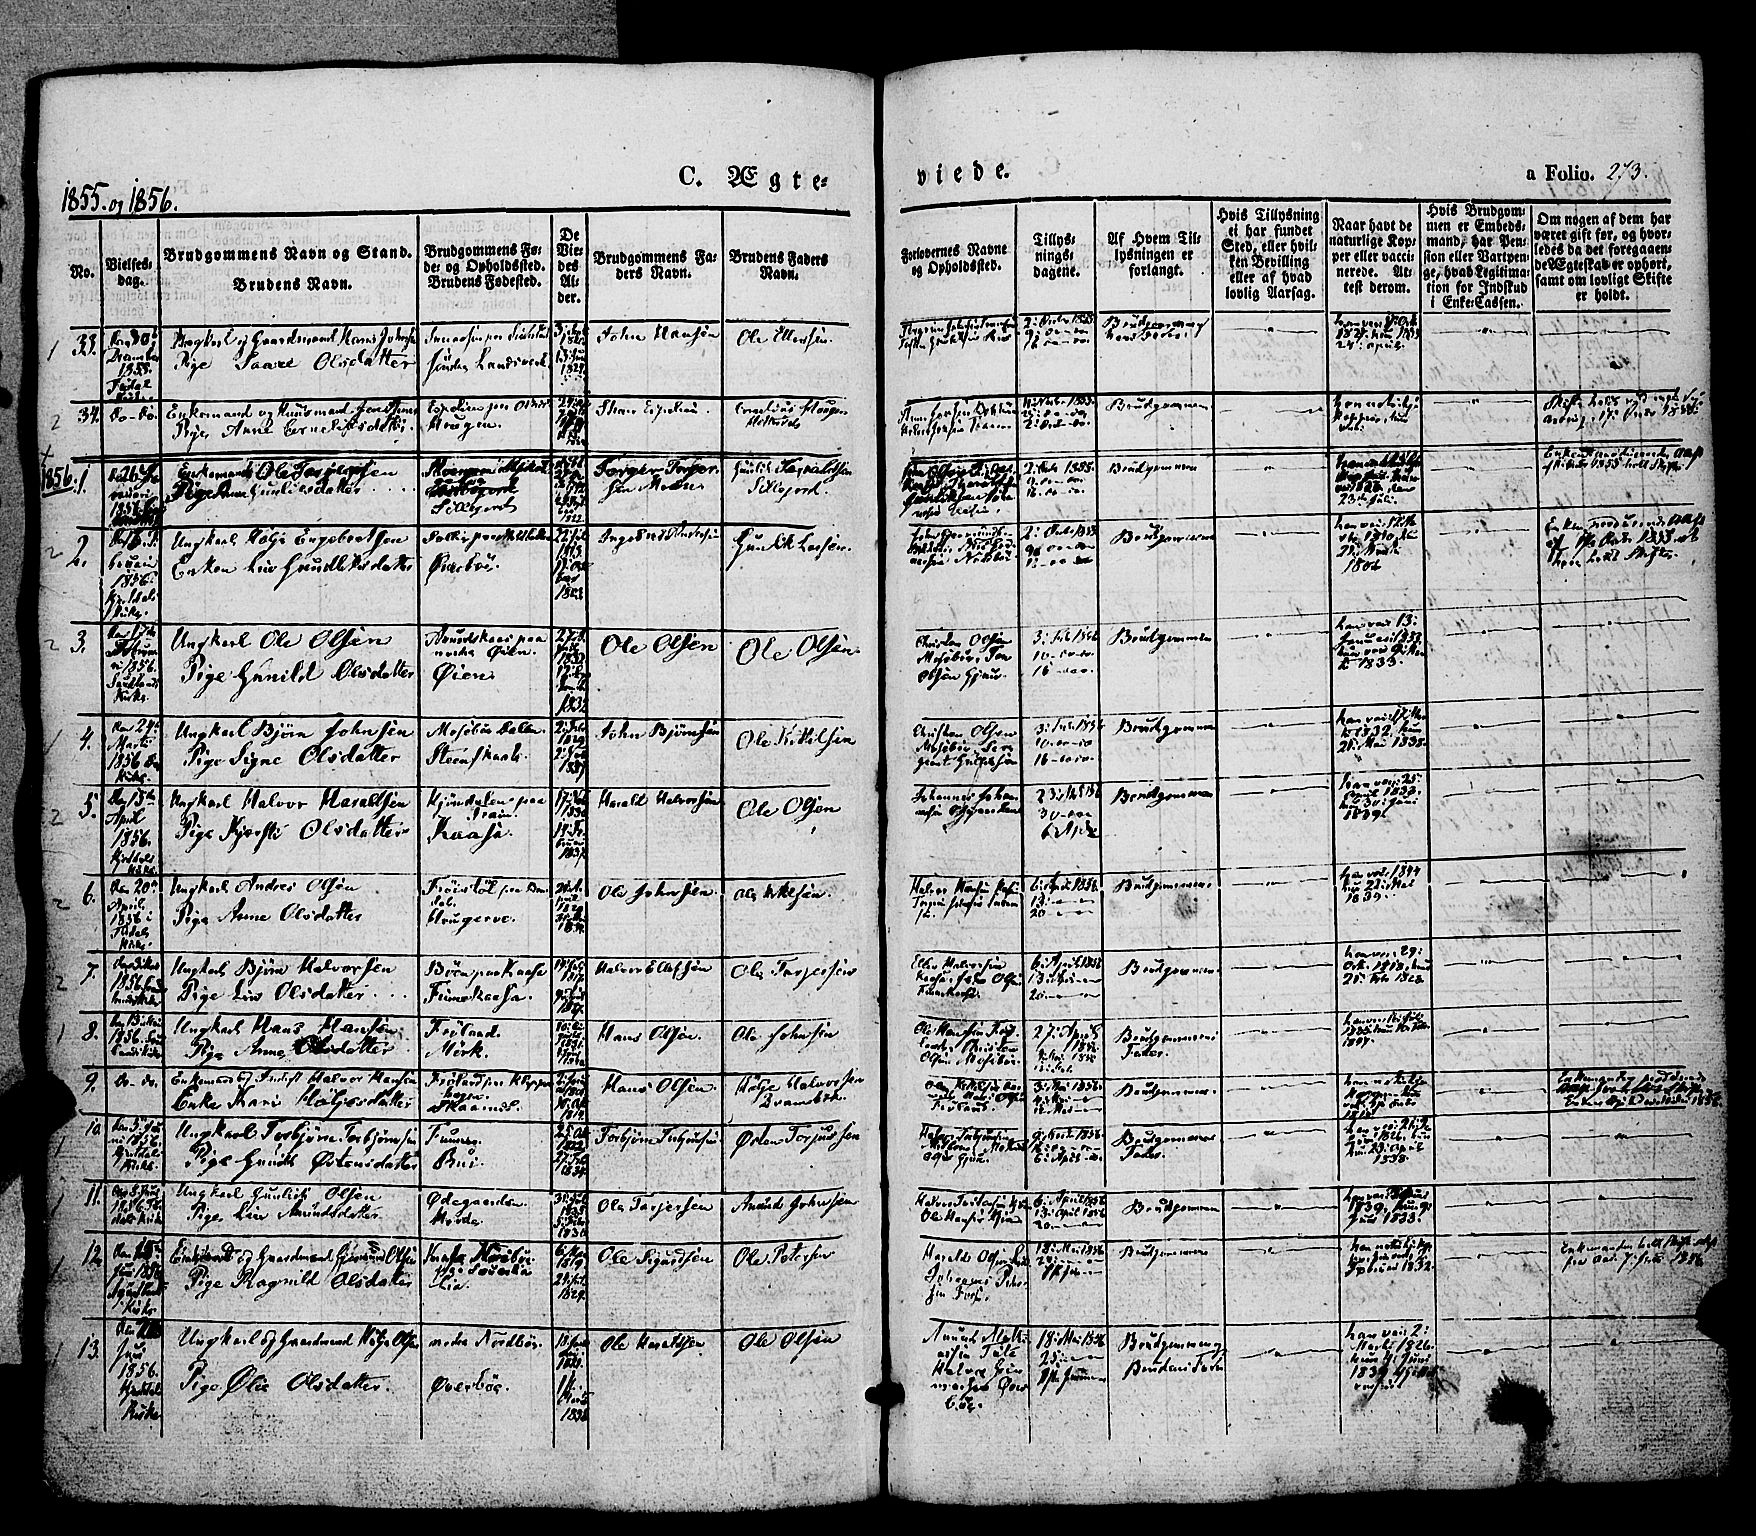 SAKO, Hjartdal kirkebøker, F/Fa/L0008: Ministerialbok nr. I 8, 1844-1859, s. 273